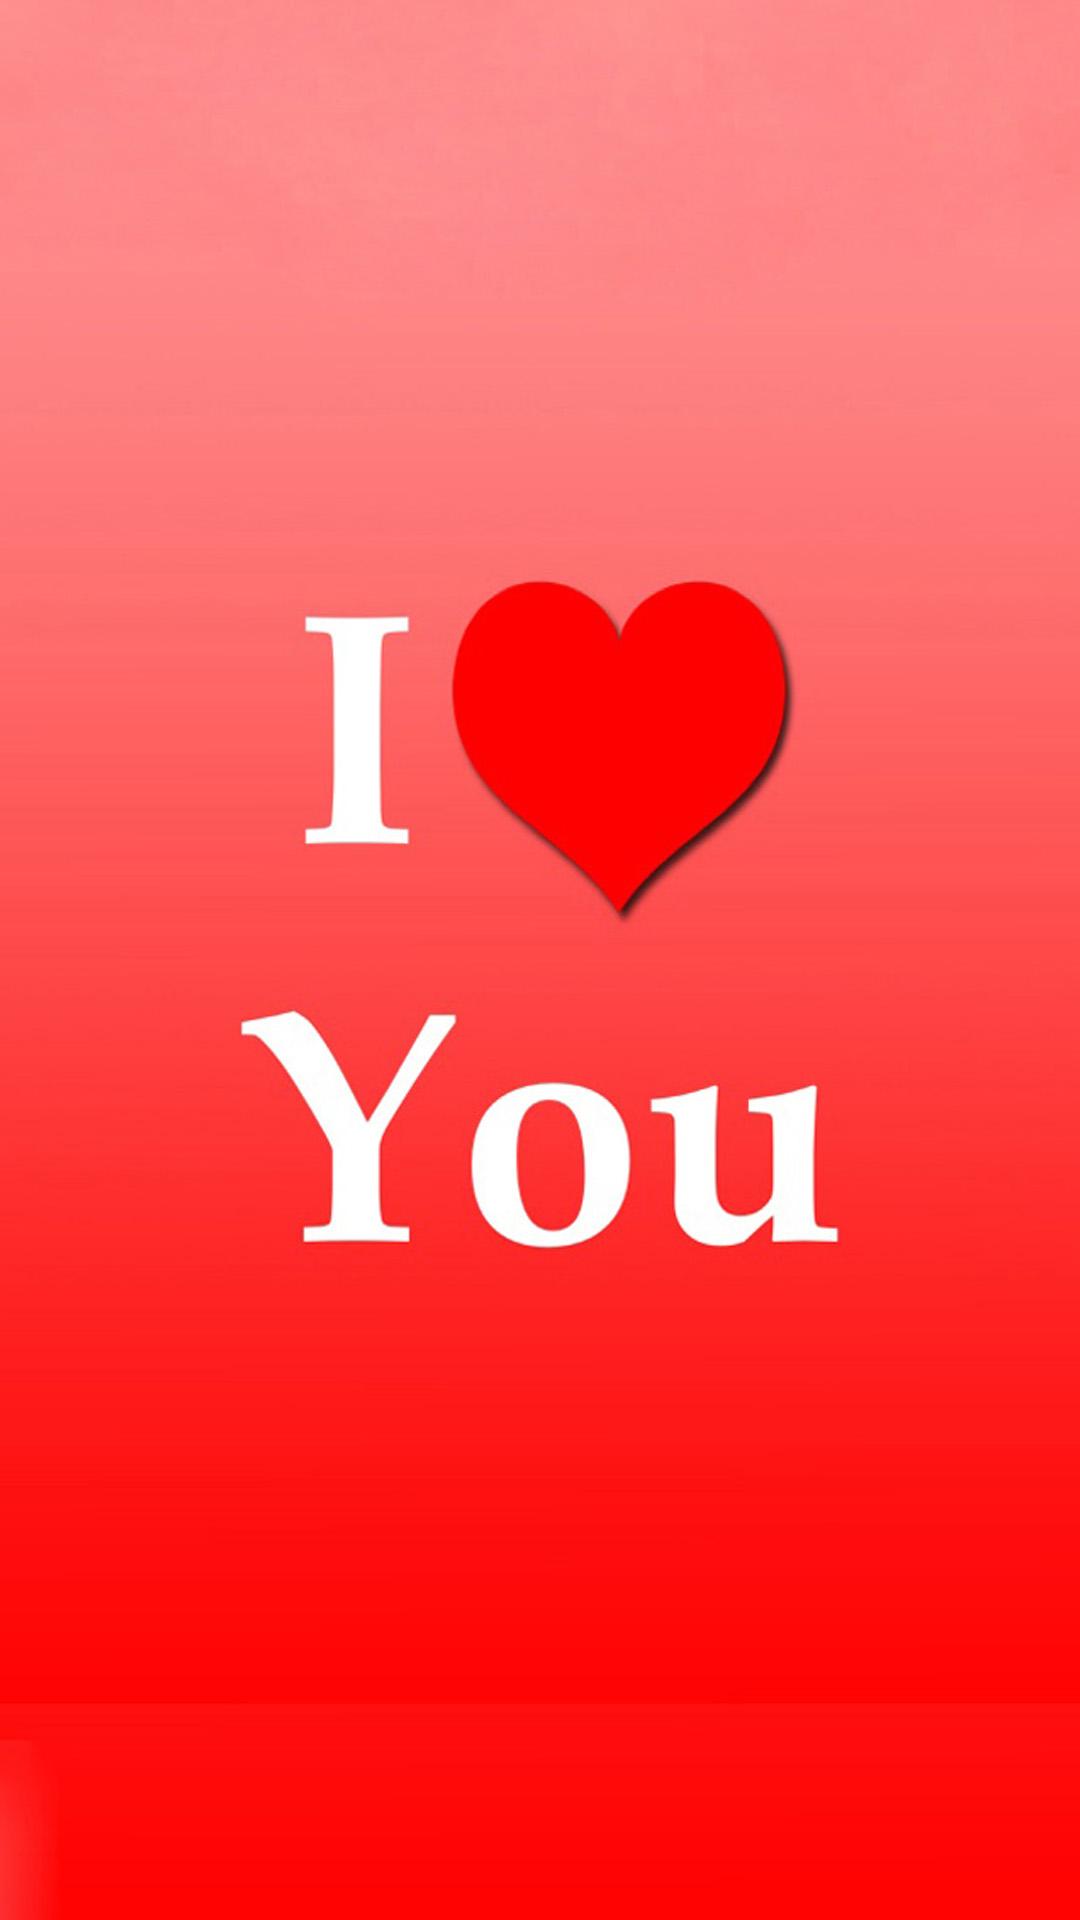 i love you heart wallpaper hd